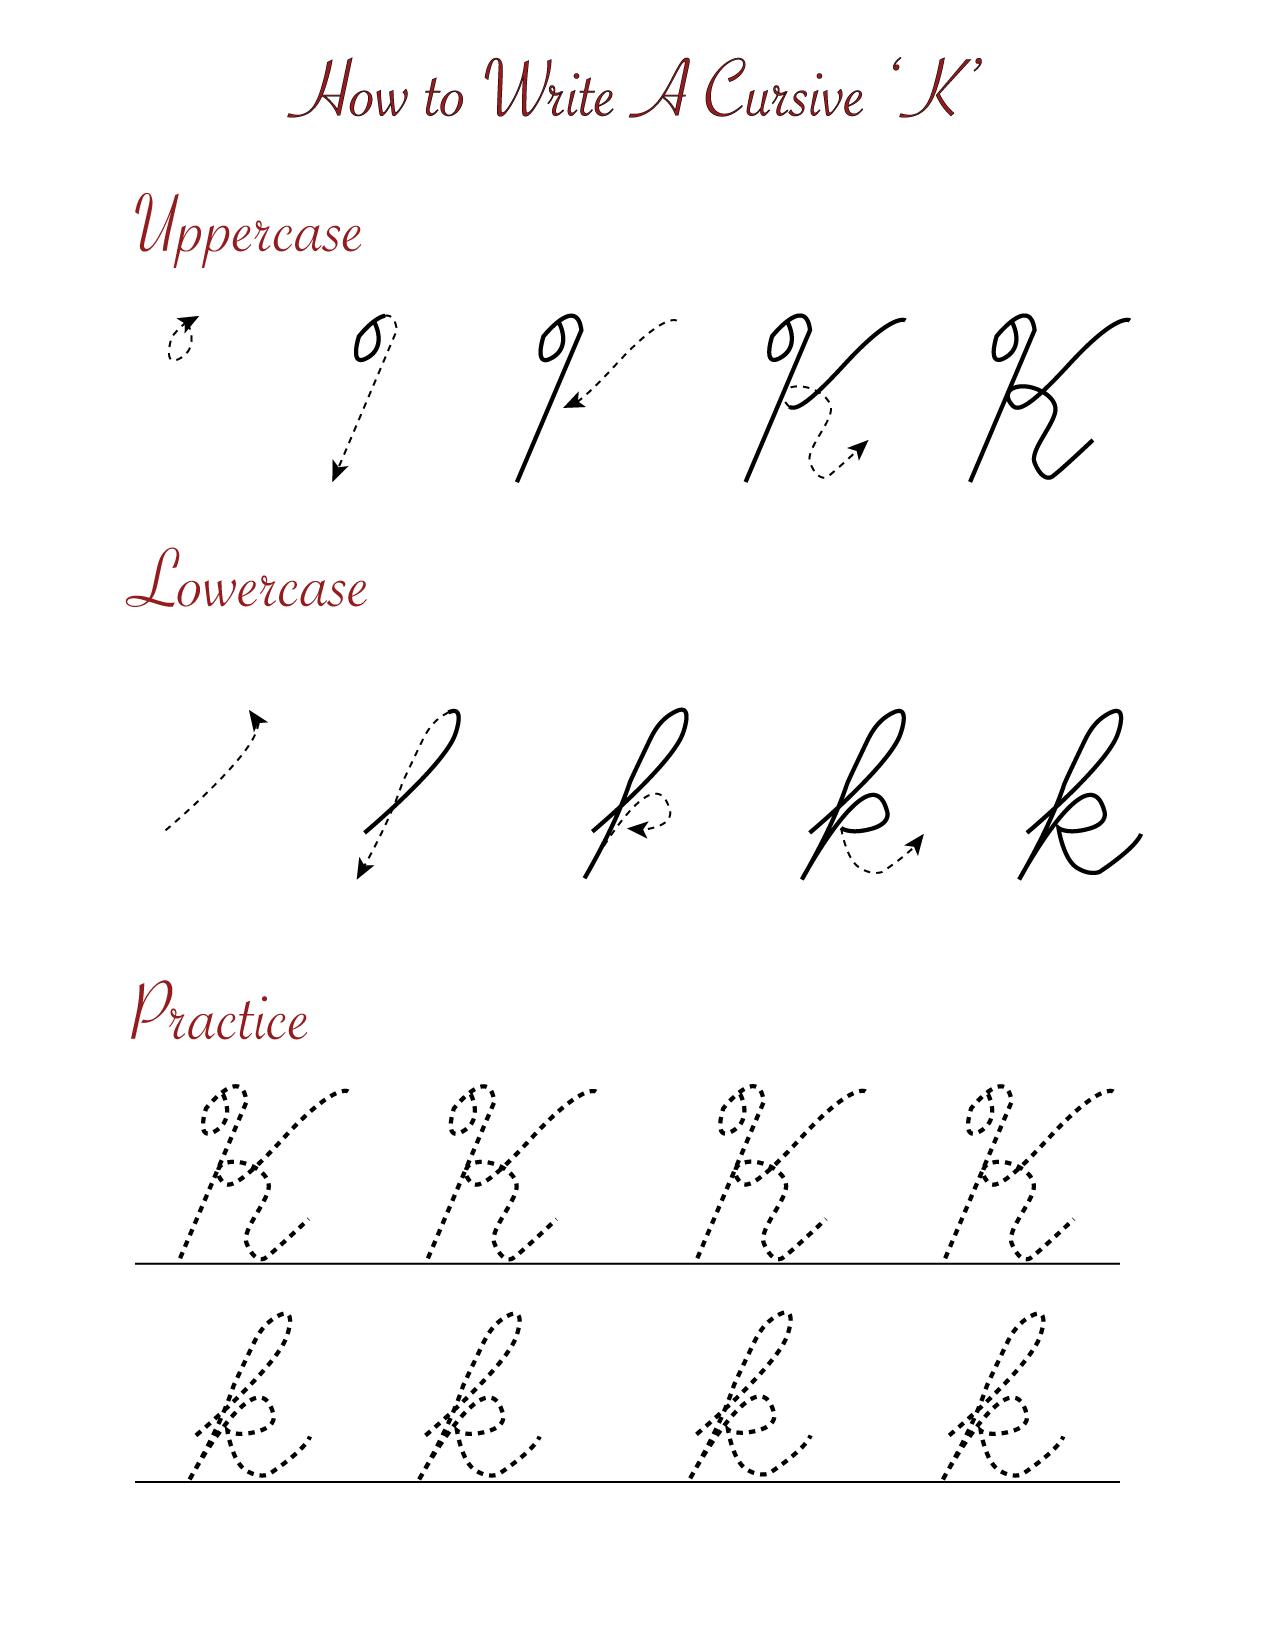 How to write a cursive 'K'